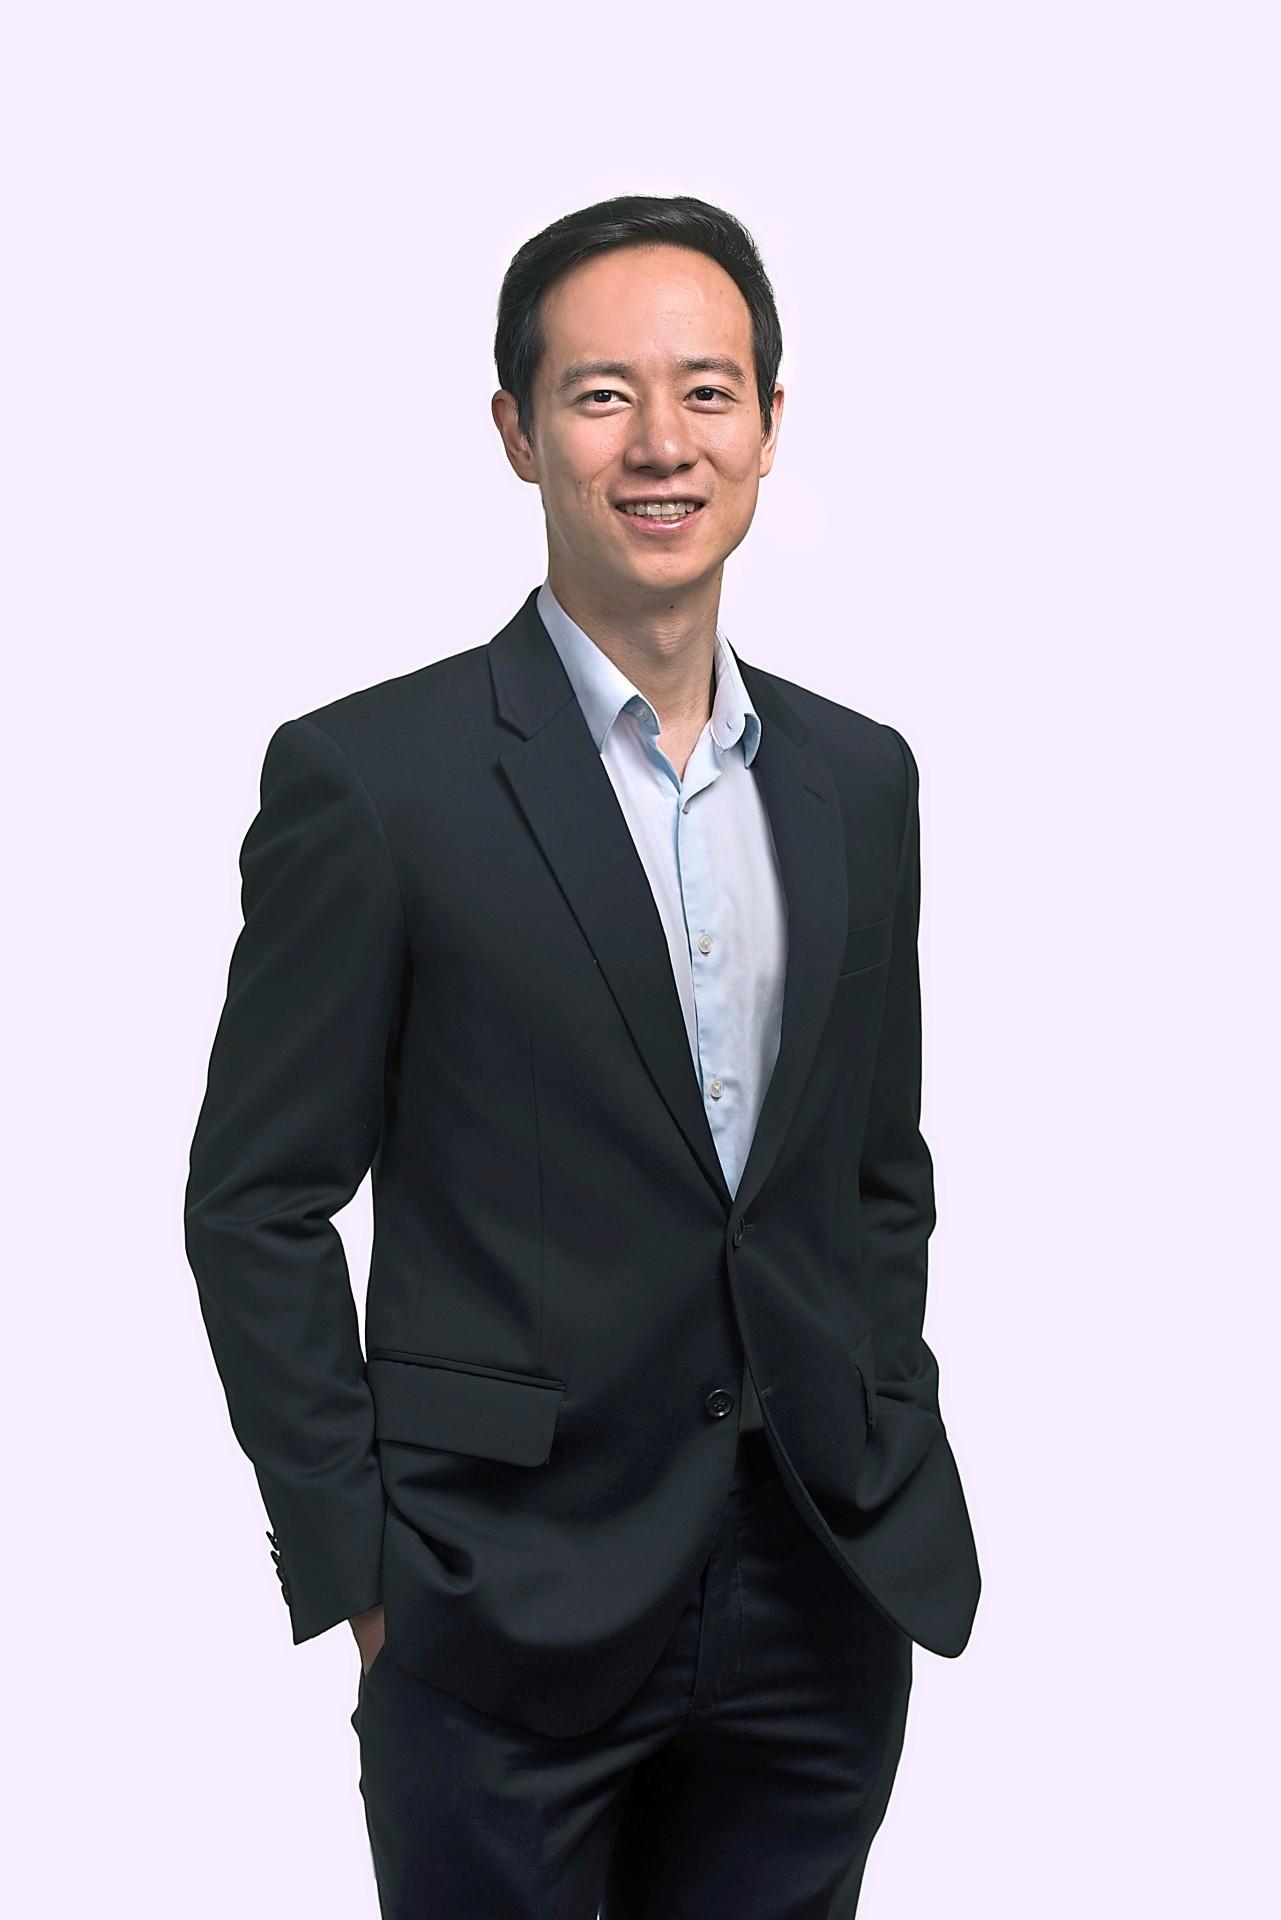 Wong: P2P provides investors better risk-reward returns.